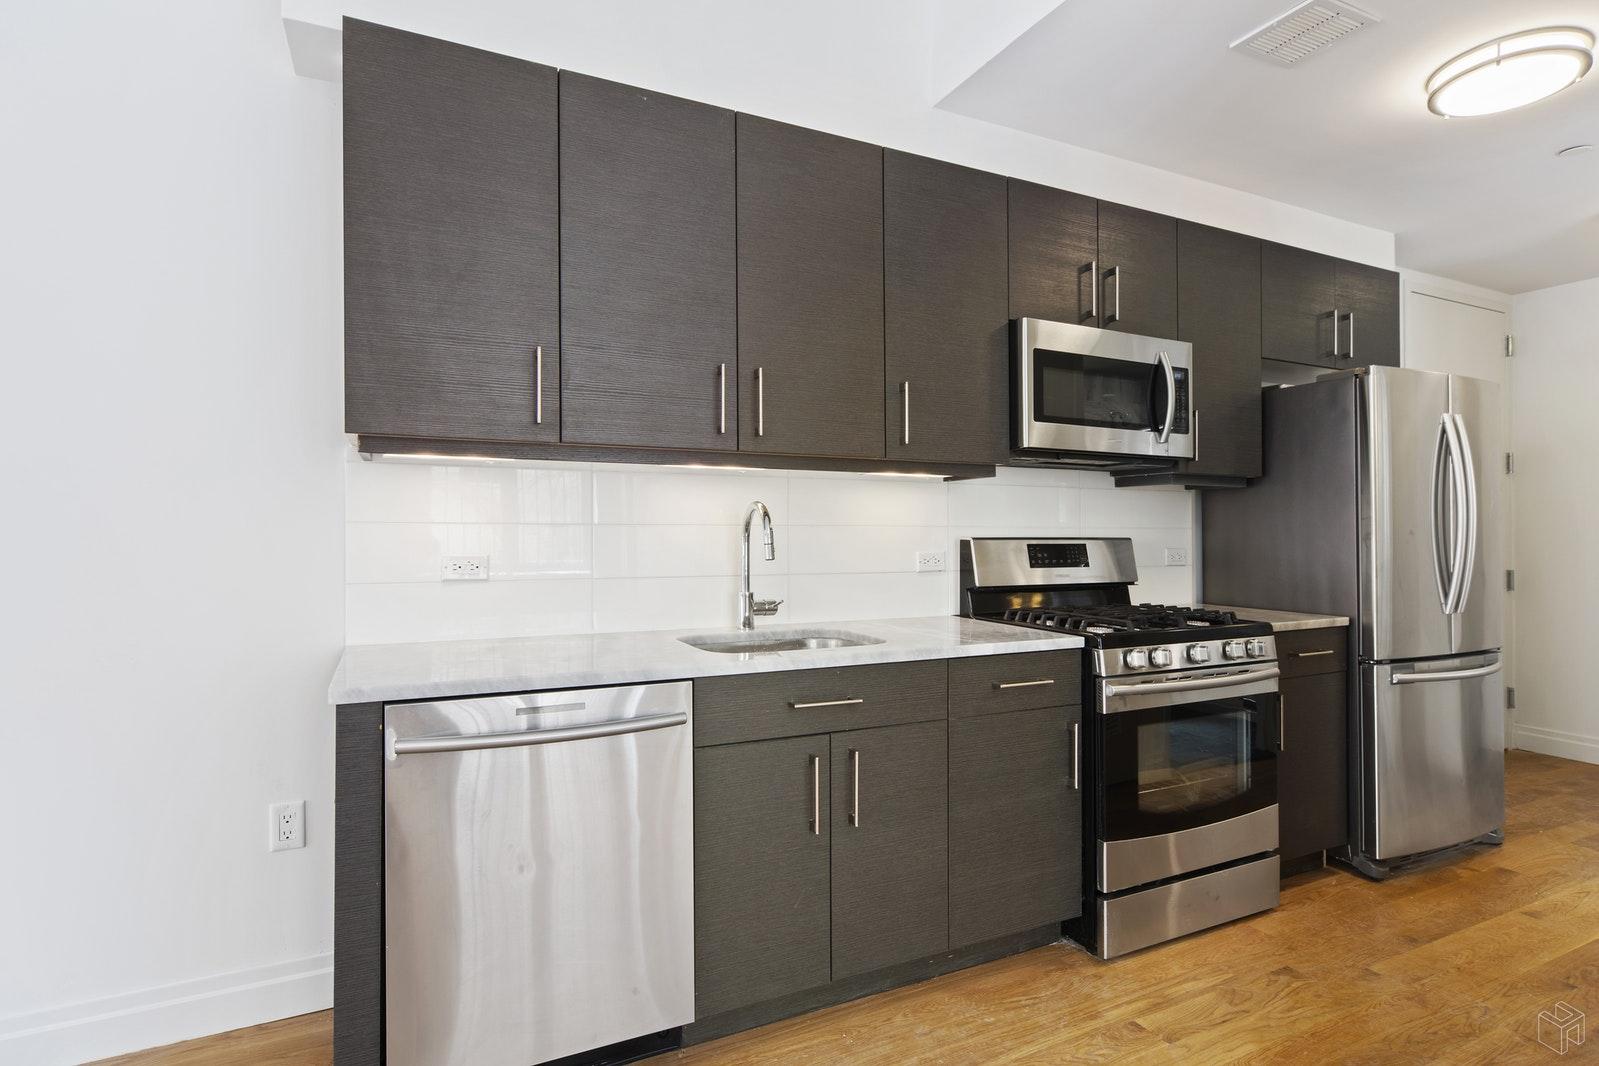 58 WEST 129TH STREET 2C, Central Harlem, $499,995, Web #: 18556006